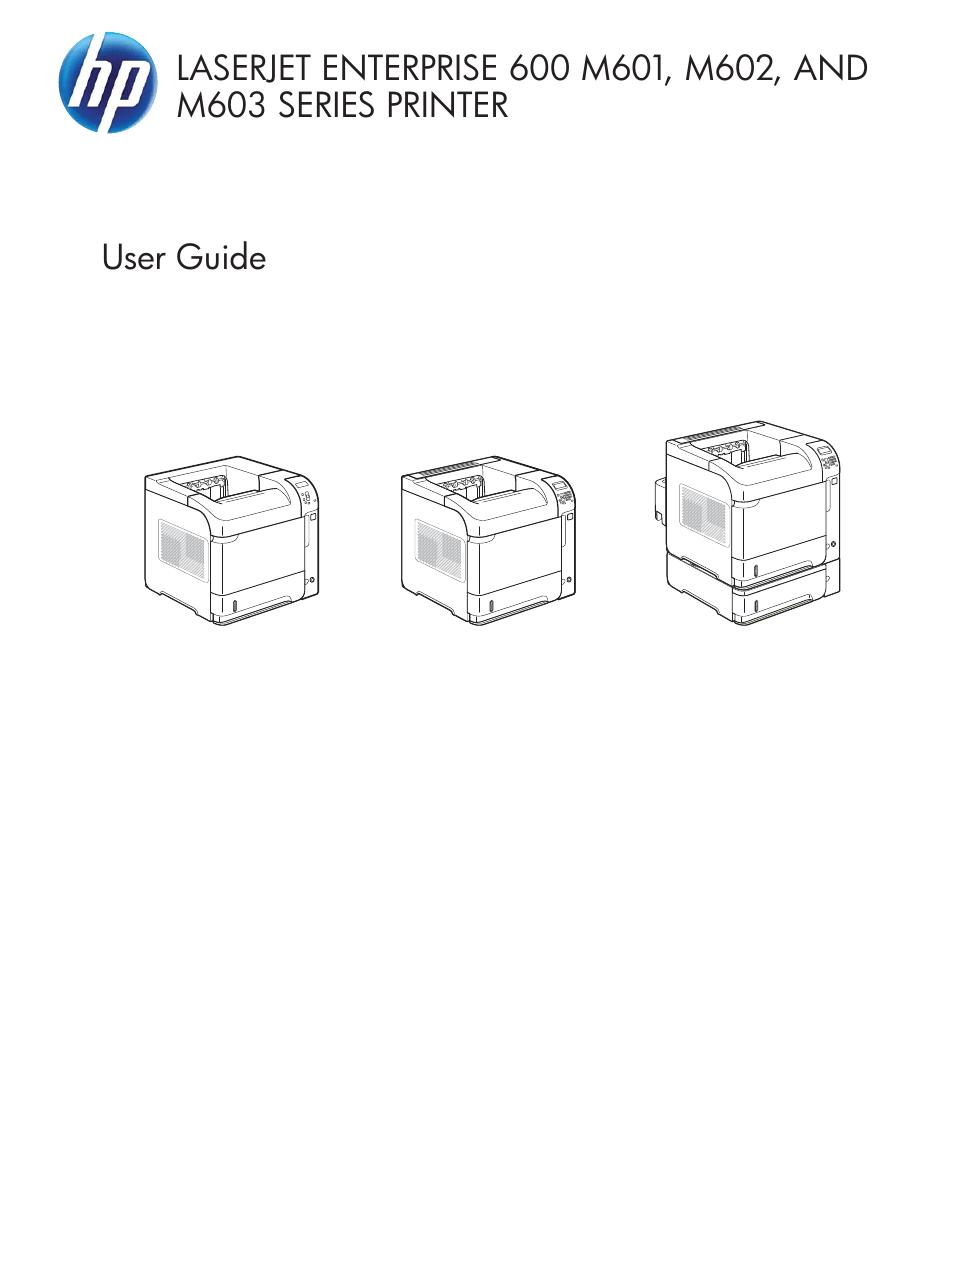 Laserjet 600 M602 Manual